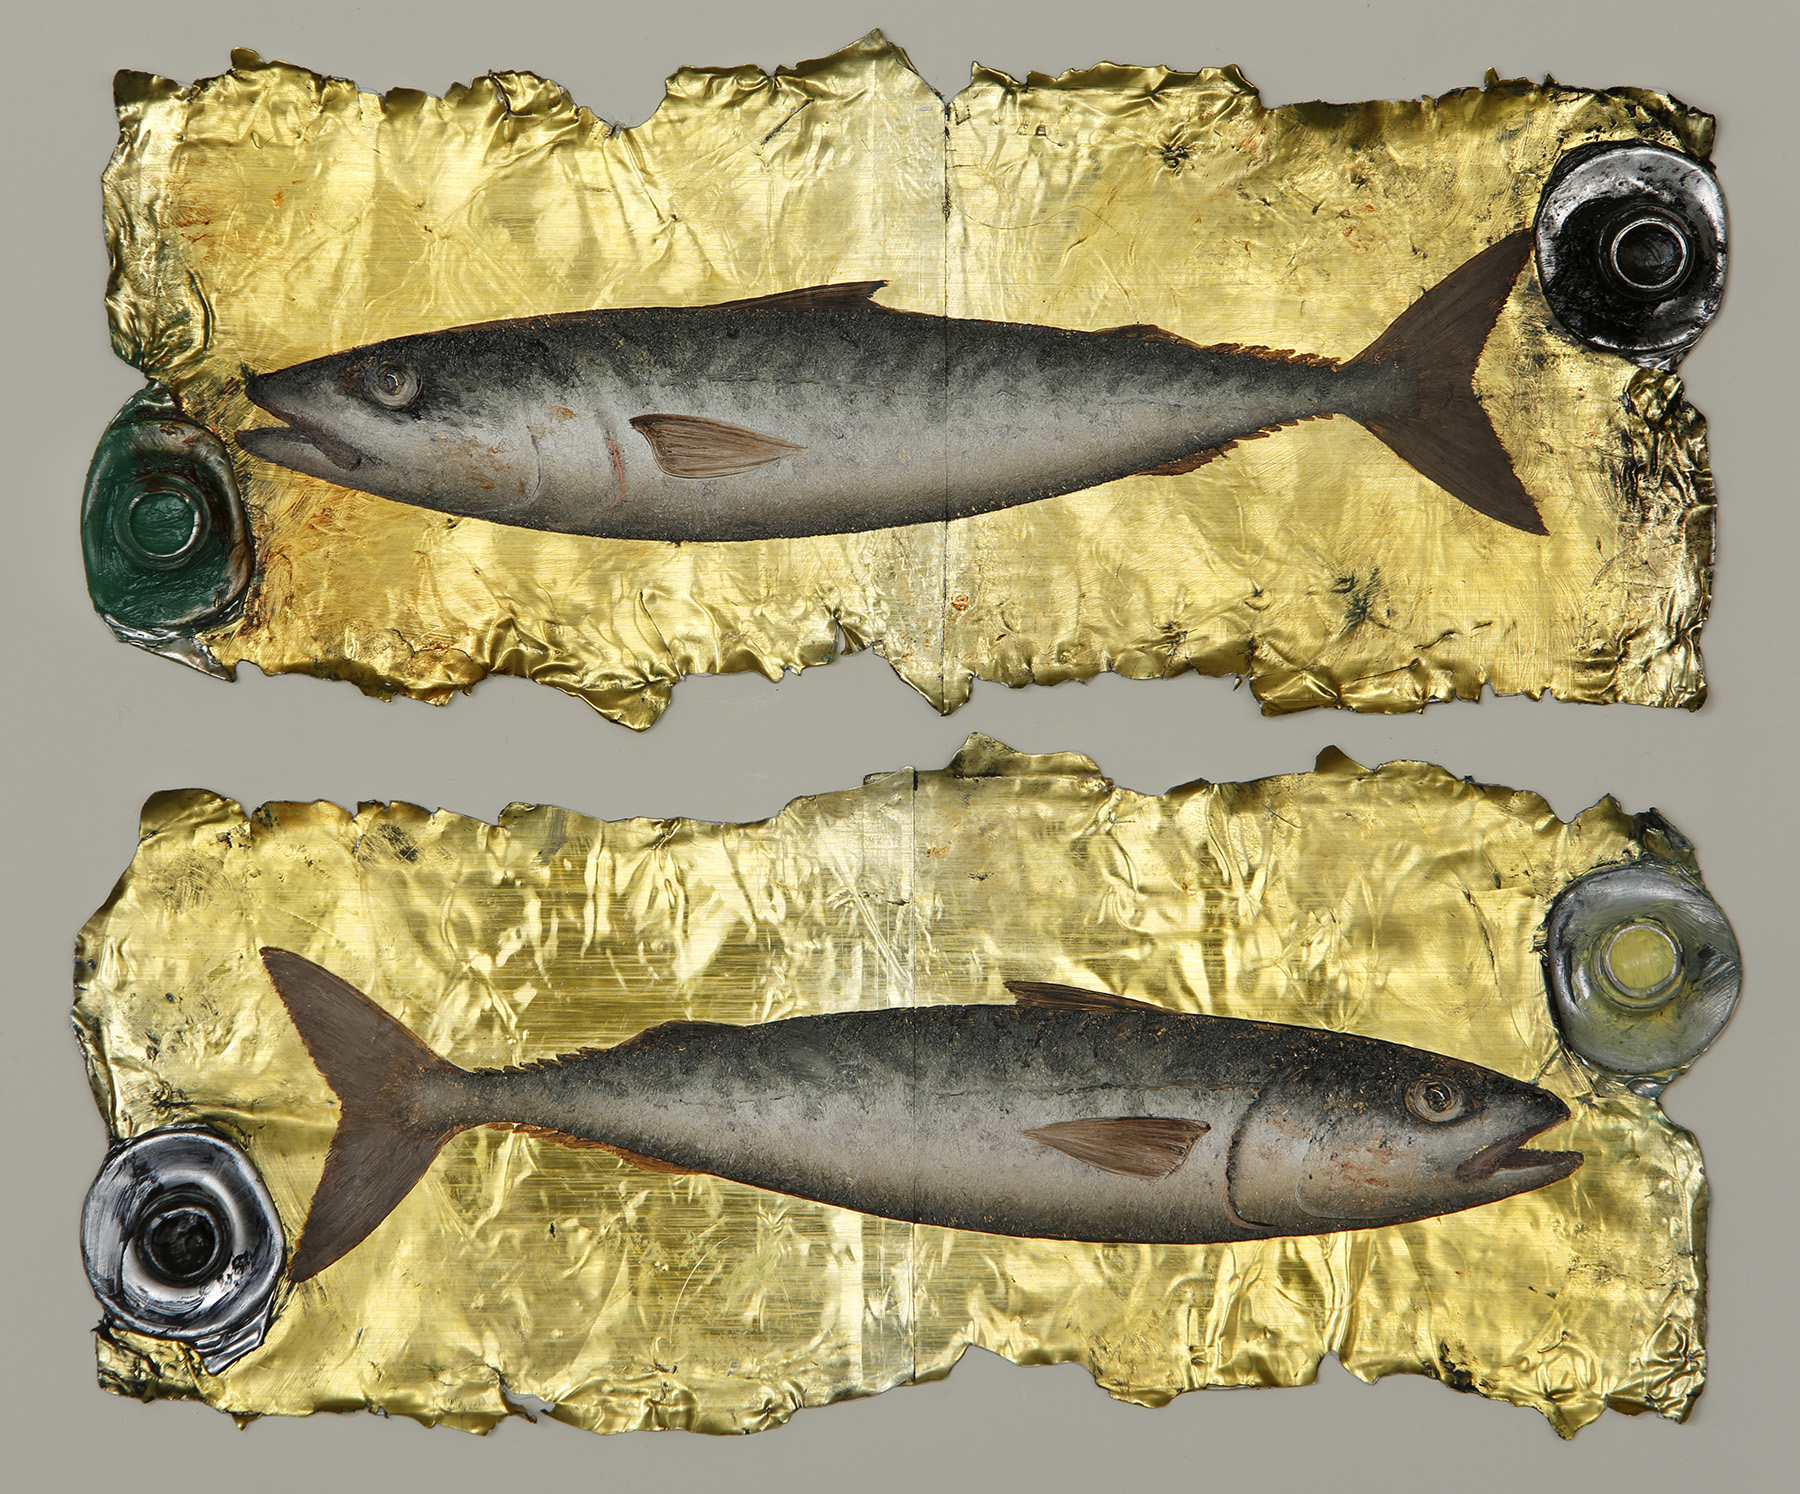 Artist: Donald Provan  Title: Double Mackerel  Size: 20 x 25 cm  Medium: Oil on paint tubes  Price: £1500